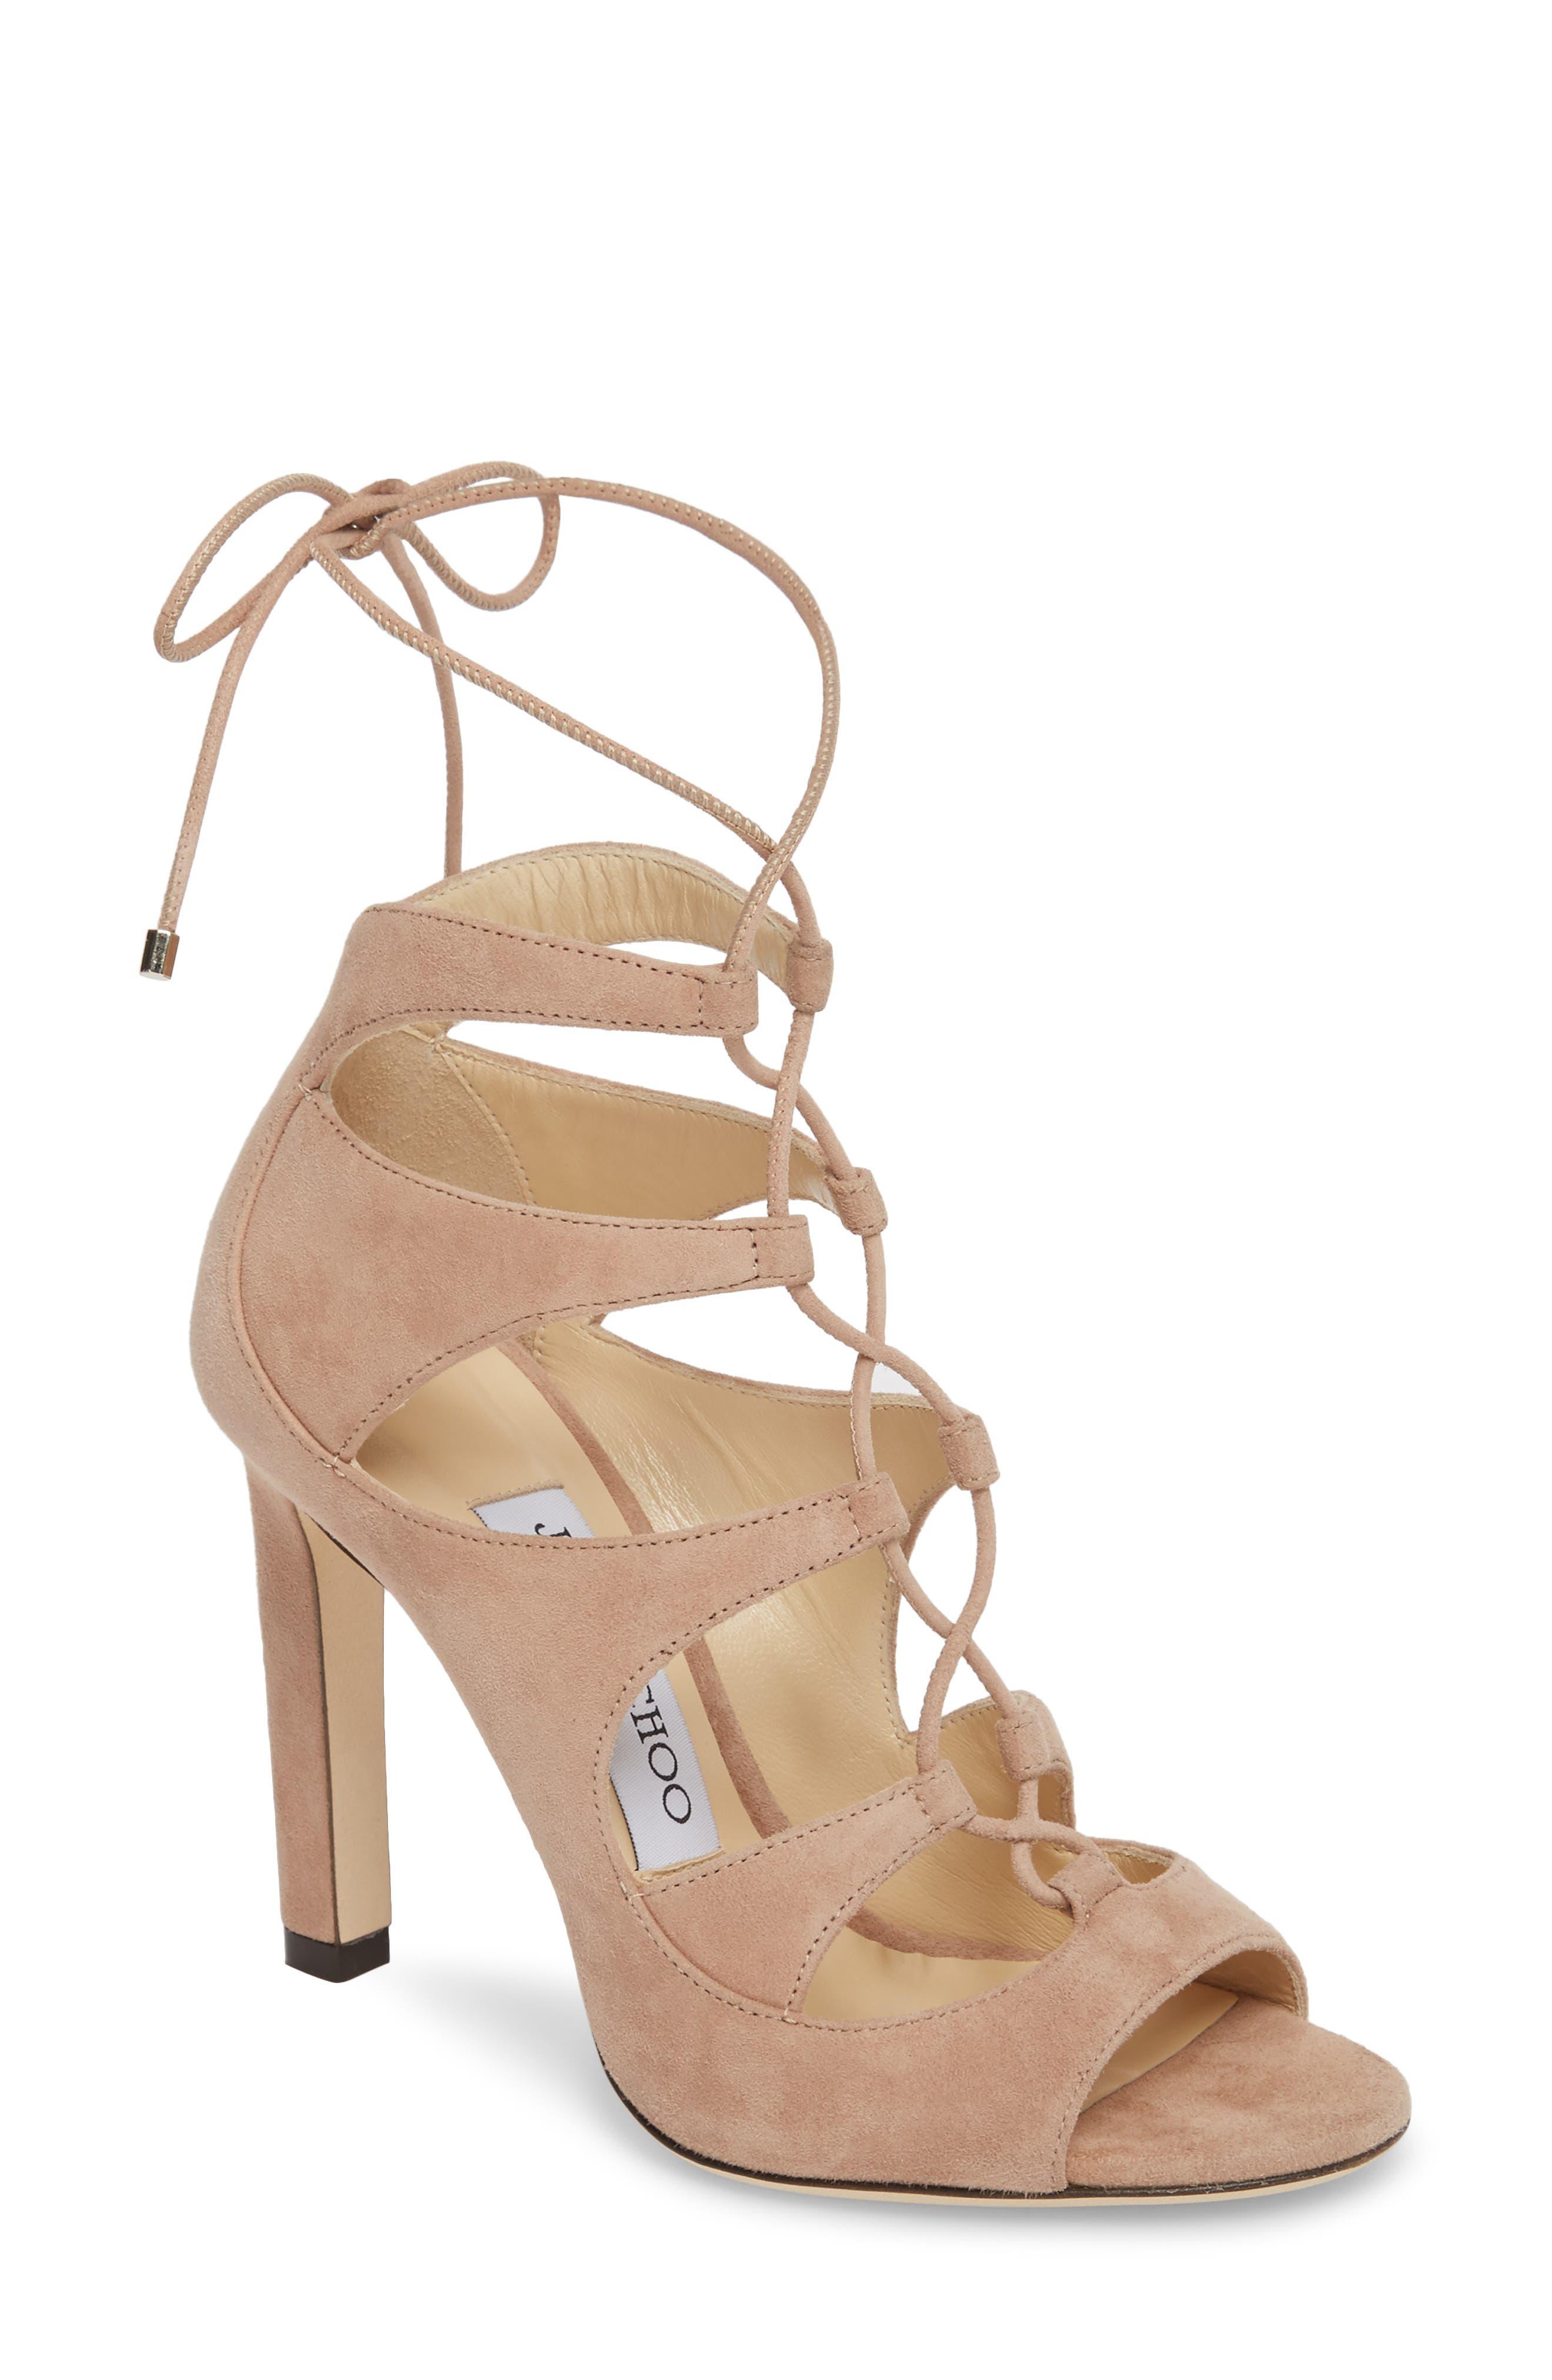 Alternate Image 1 Selected - Jimmy Choo Blake Lace-Up Sandal (Women)